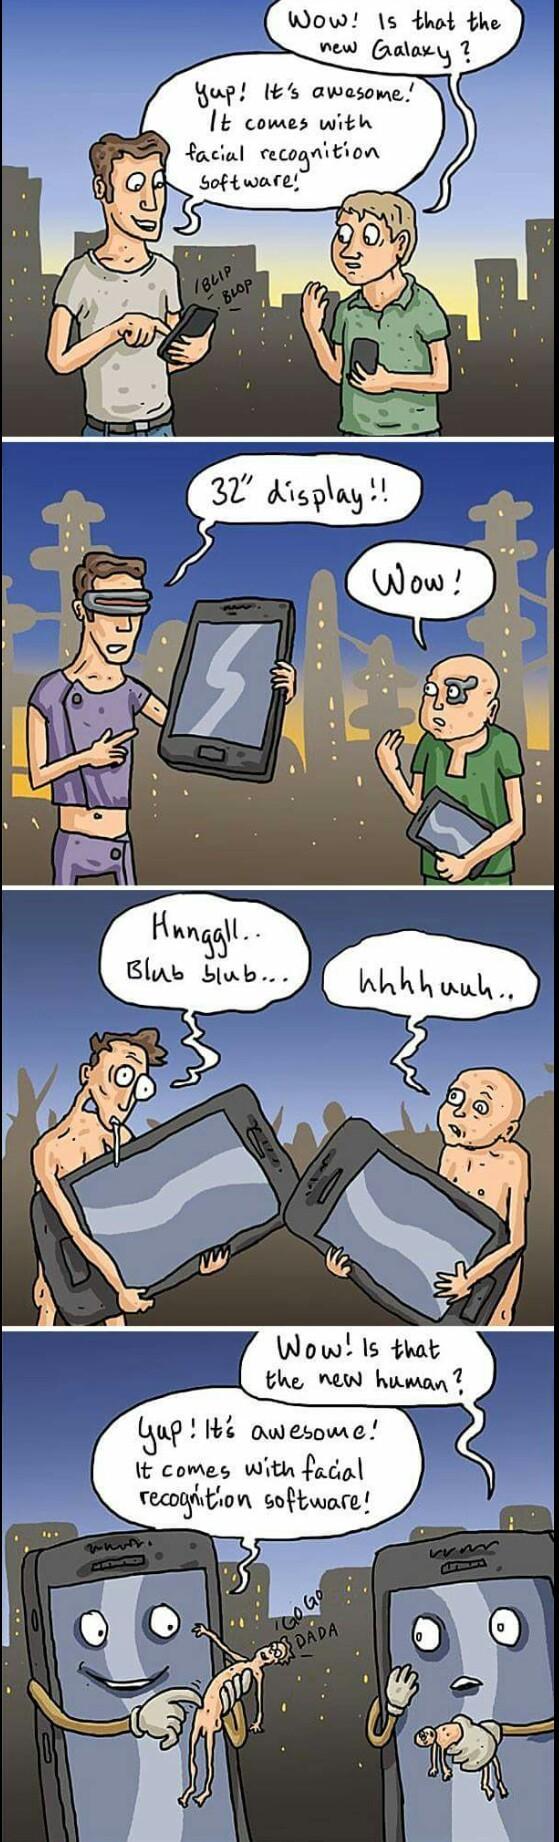 Smartphone - meme